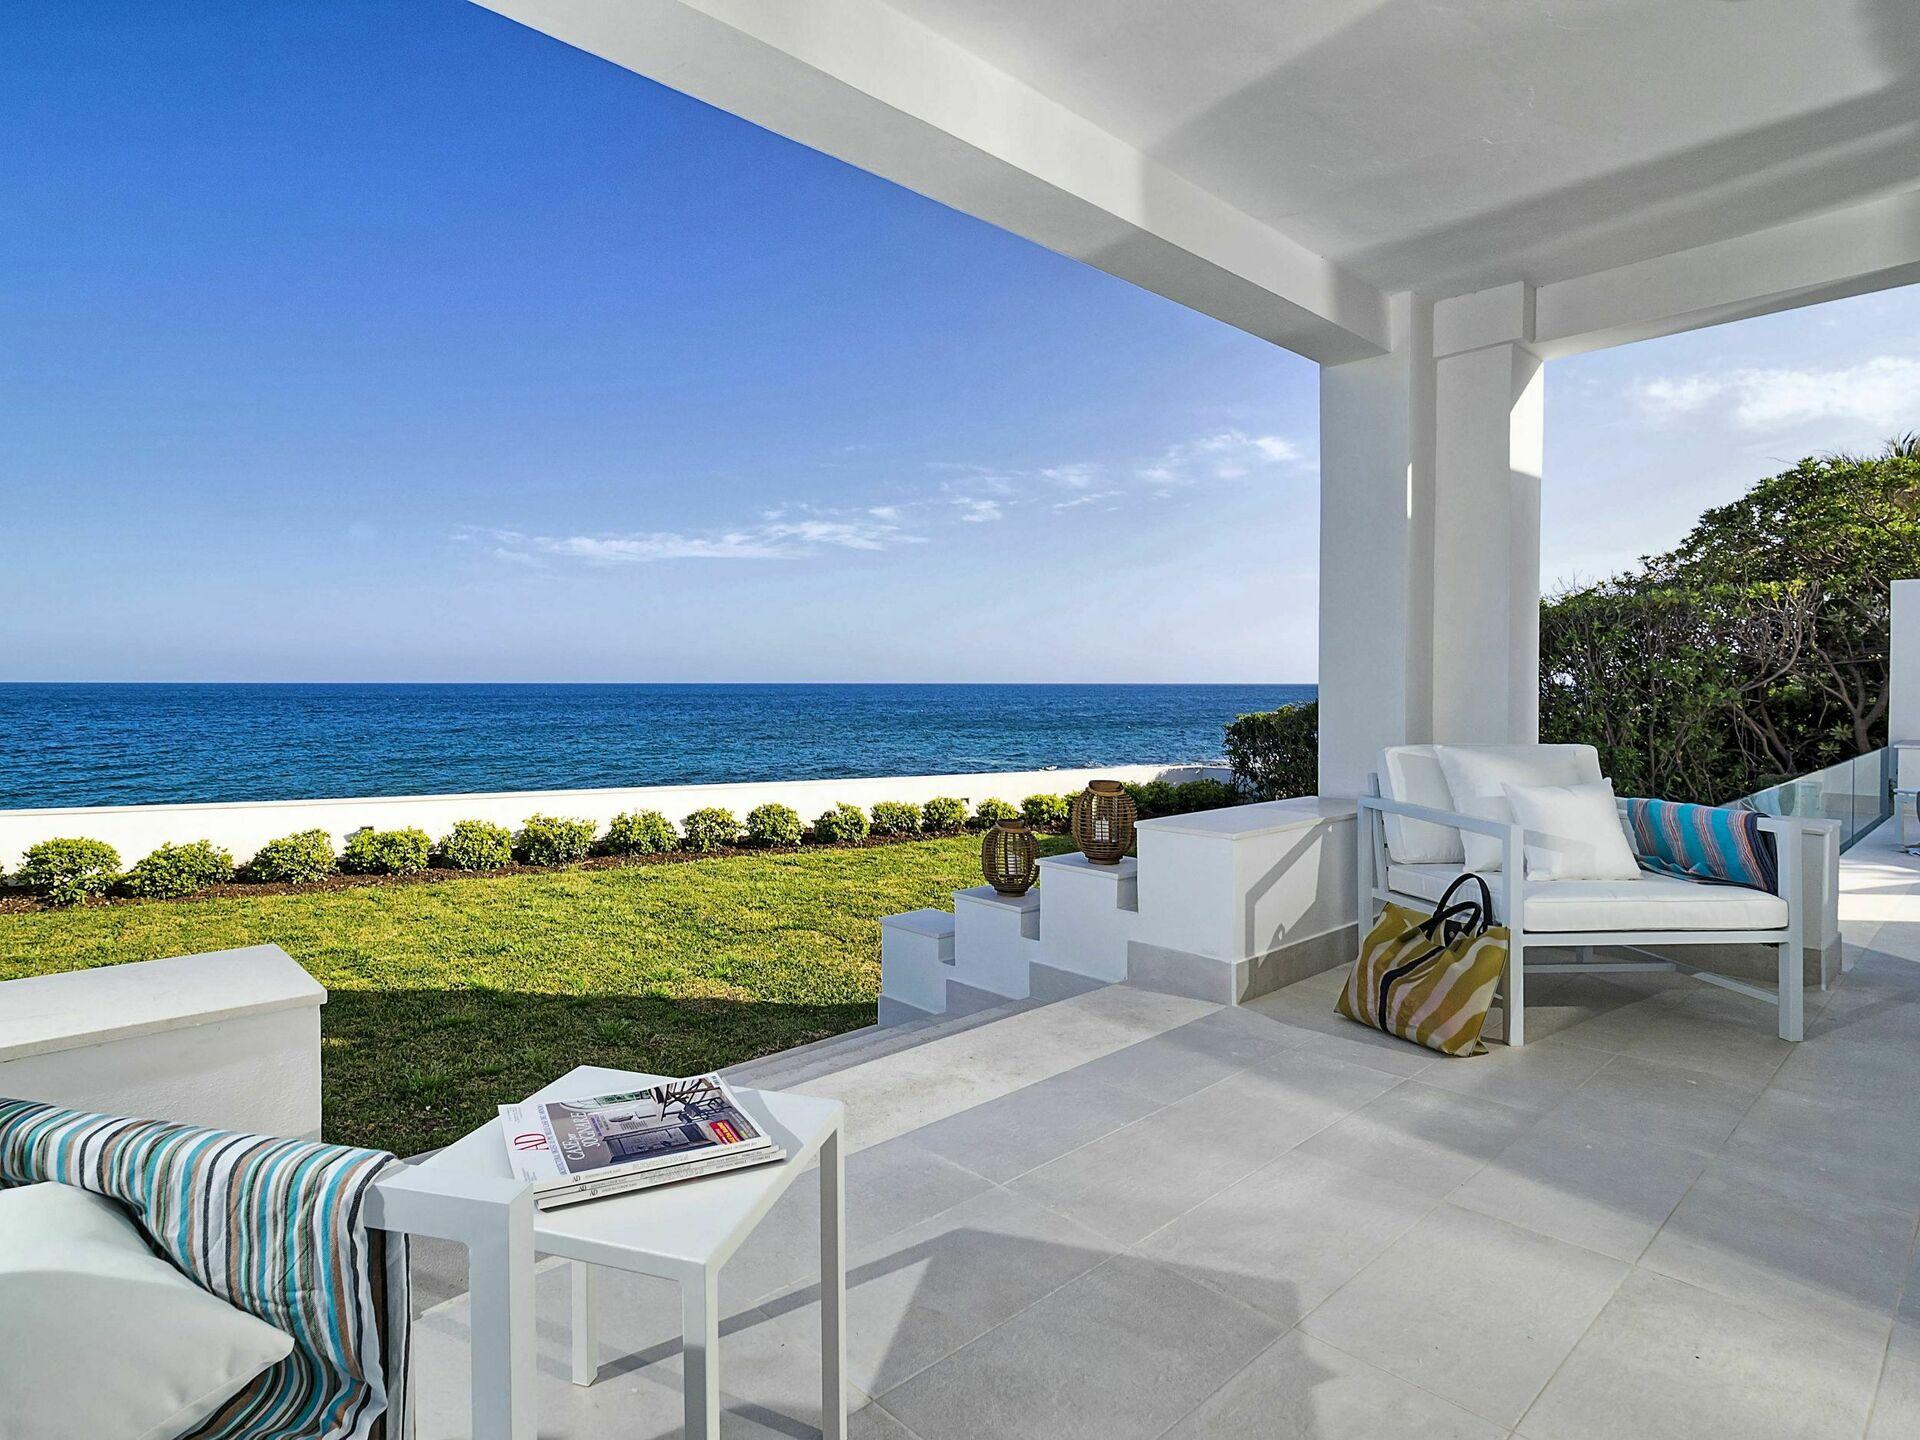 yout holiday vacation rentals - HD1920×1440